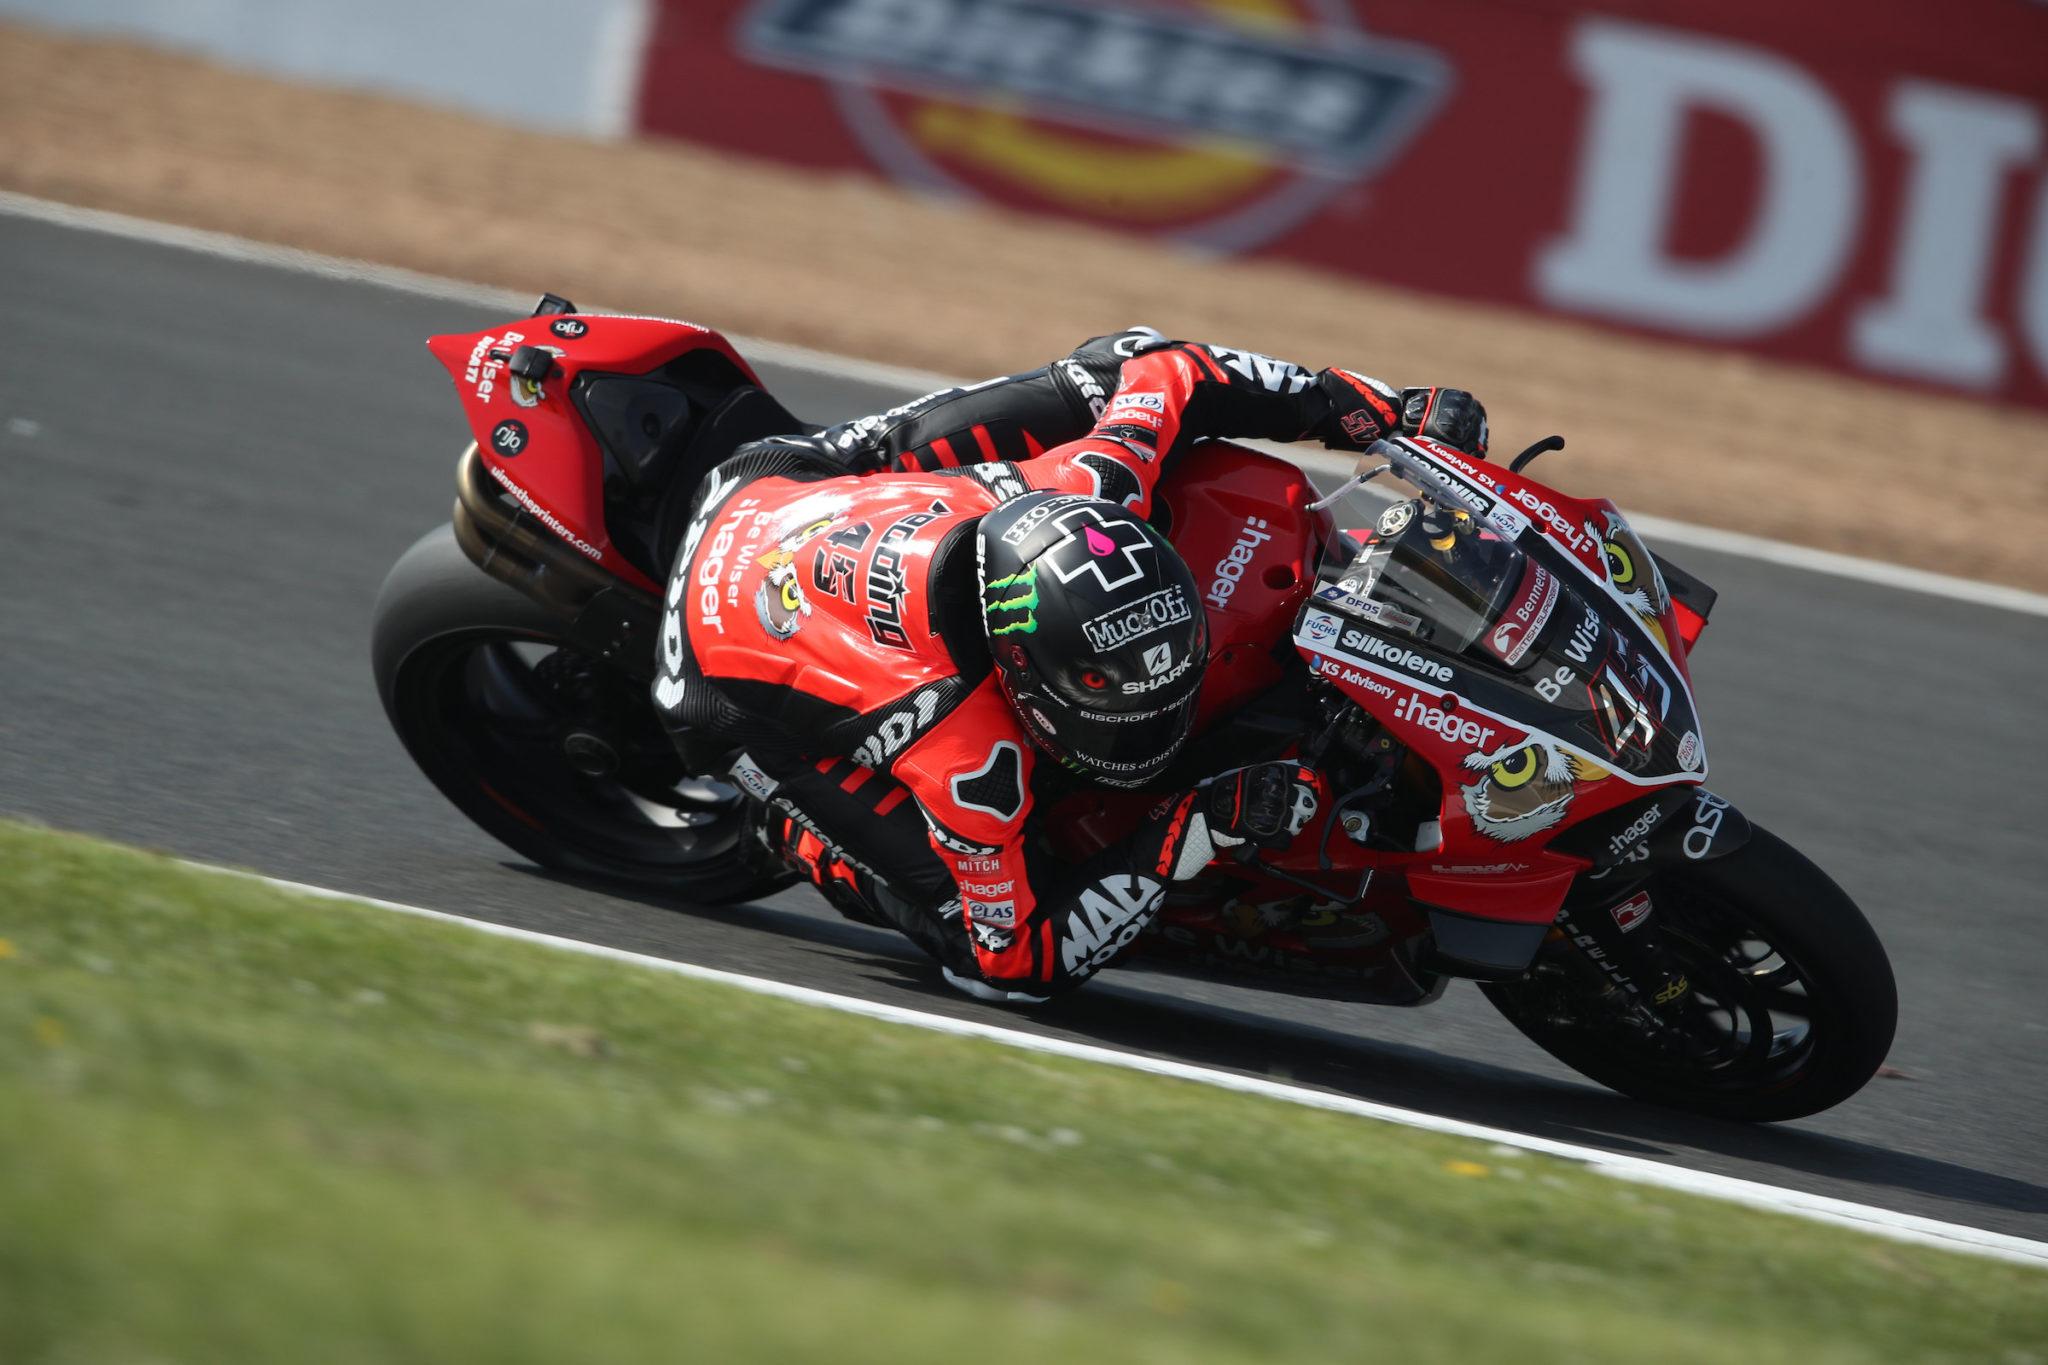 Scott Redding BSB Be Wiser Ducati